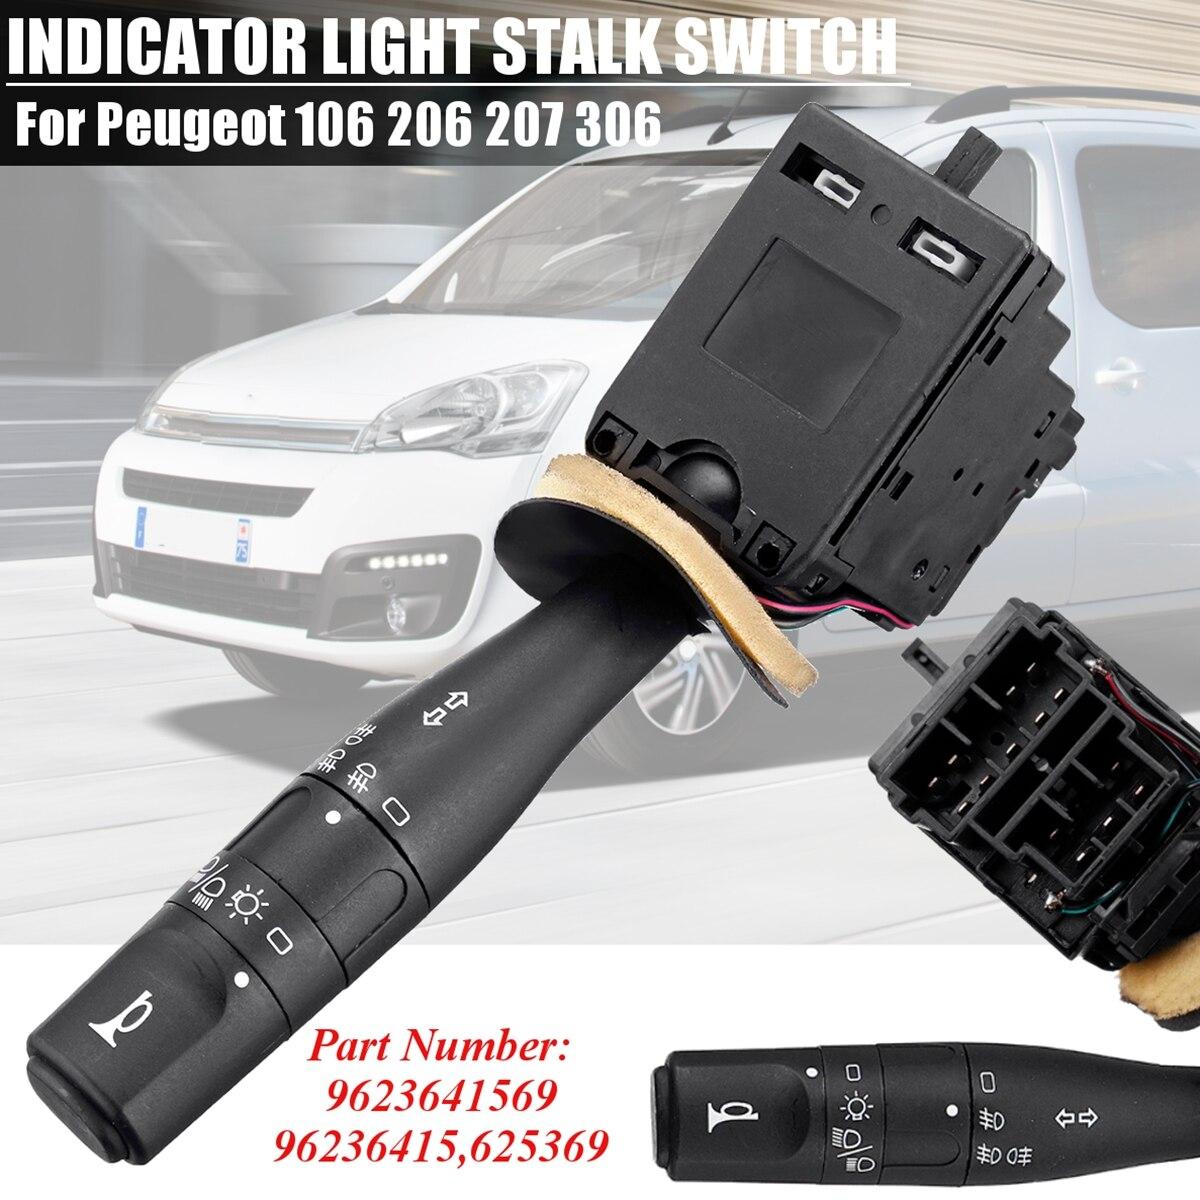 PEUGEOT 206 406 605 806 INDICATOR LIGHT STALK COLUMN SWITCH 625367 625368